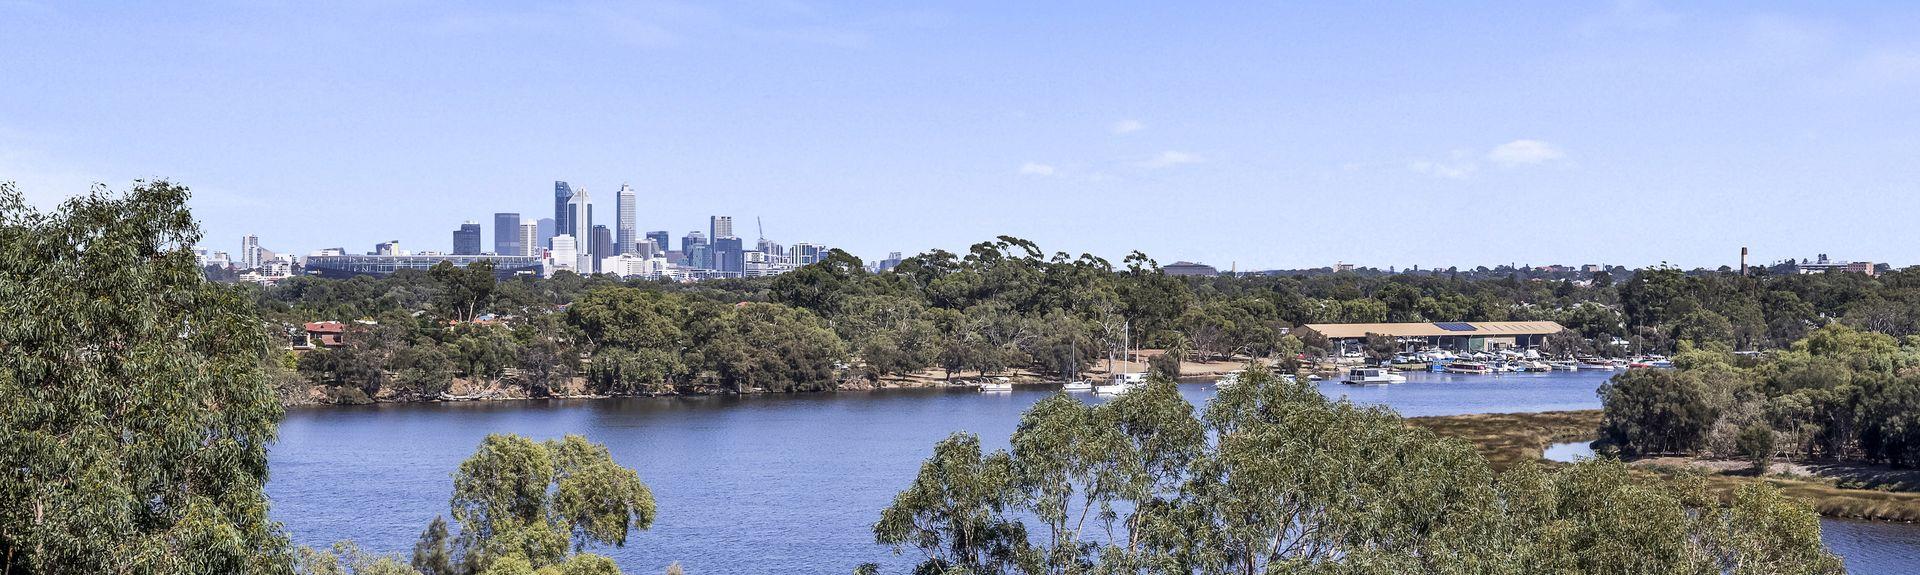 Stratton, Perth, Western Australia, Australië